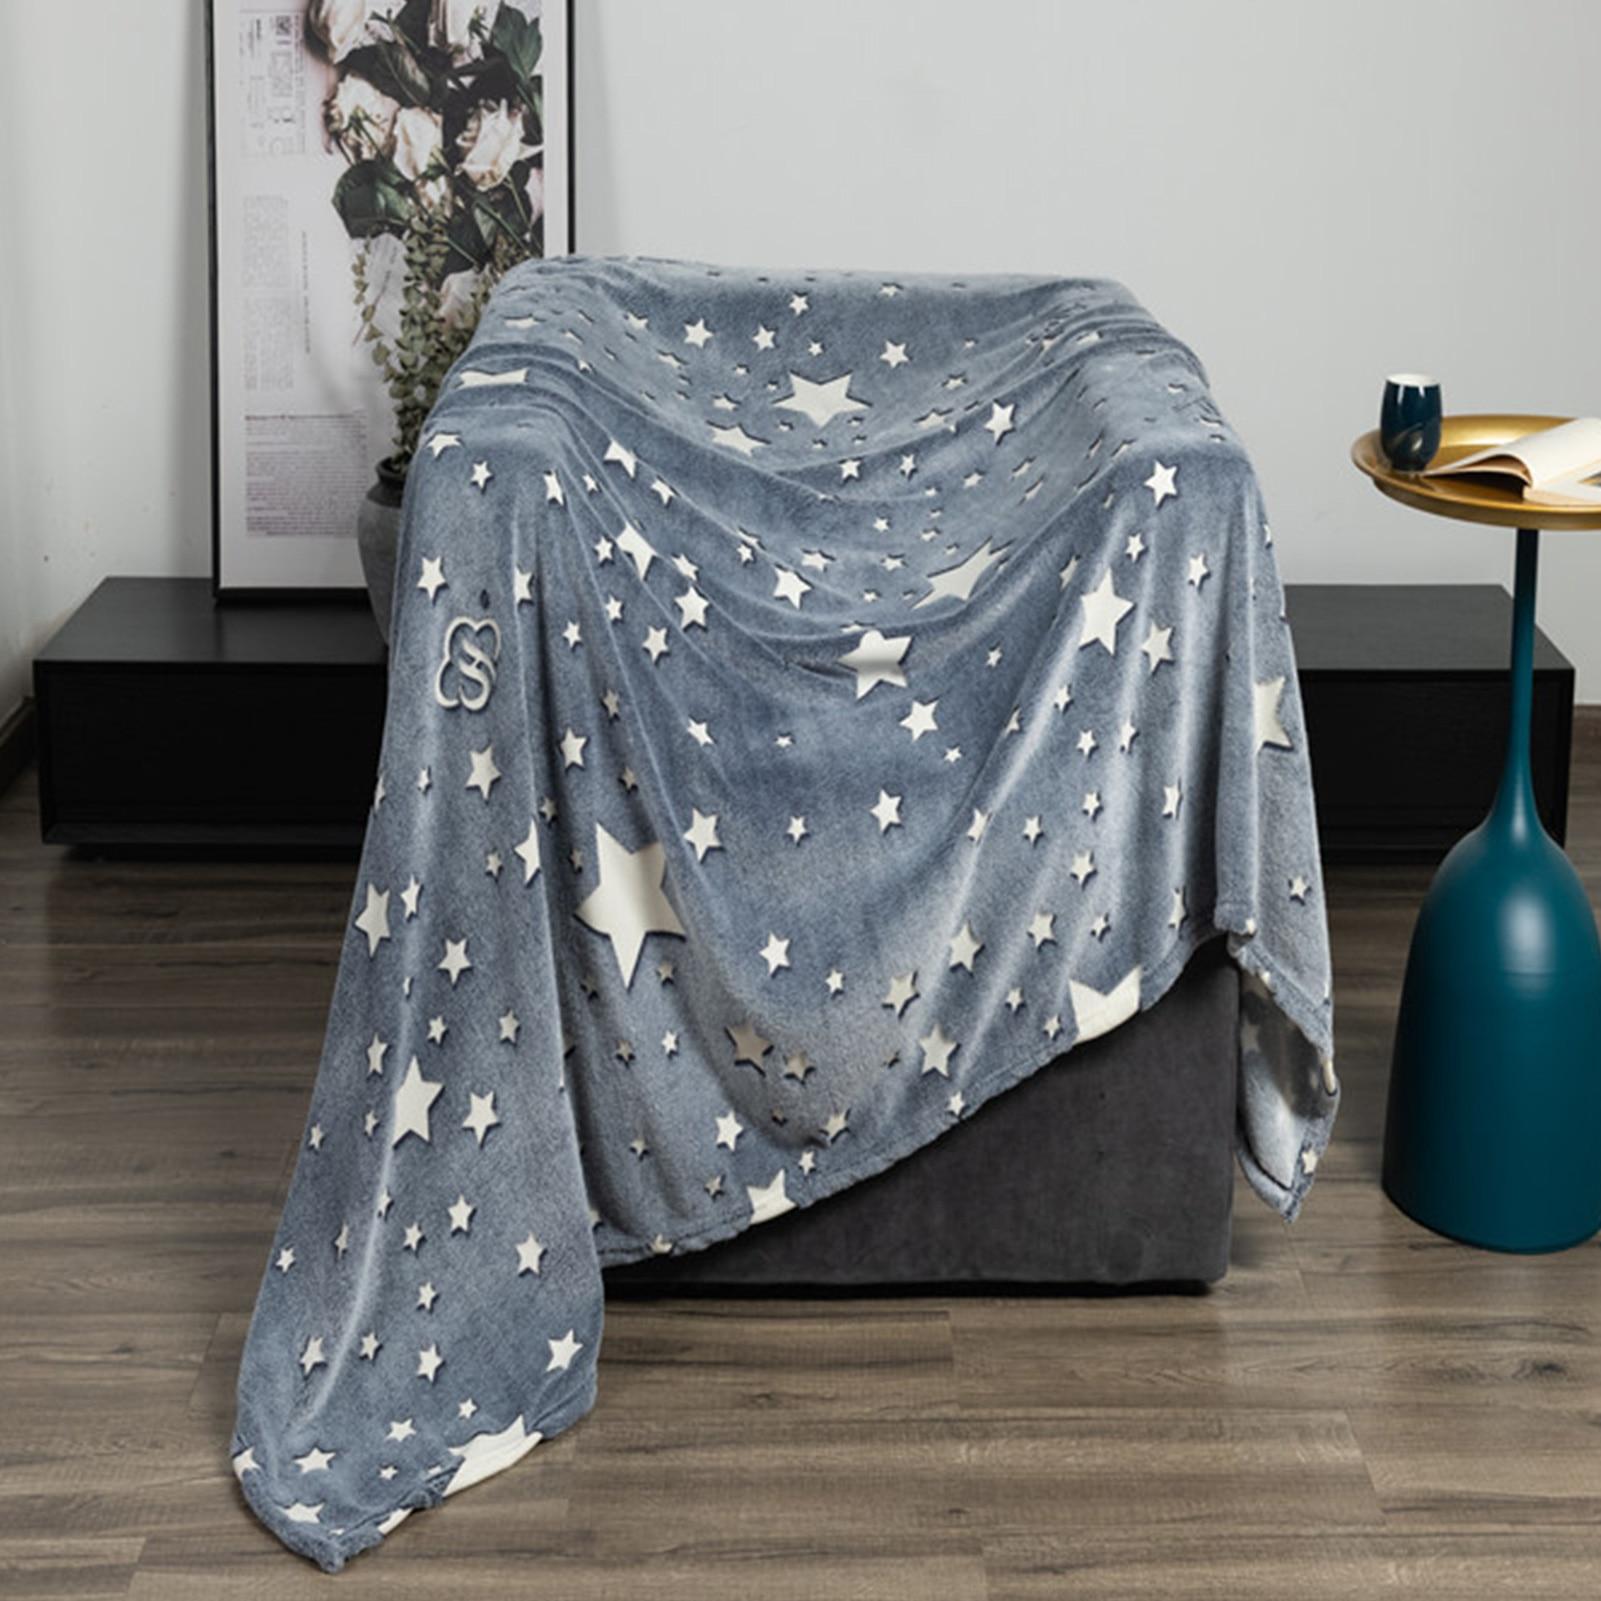 Cartoon Animals Glow In The Dark Throw Blanket Single-layer Thickening Flannel Fine And Soft Flannel Wrap Blanket For Kids